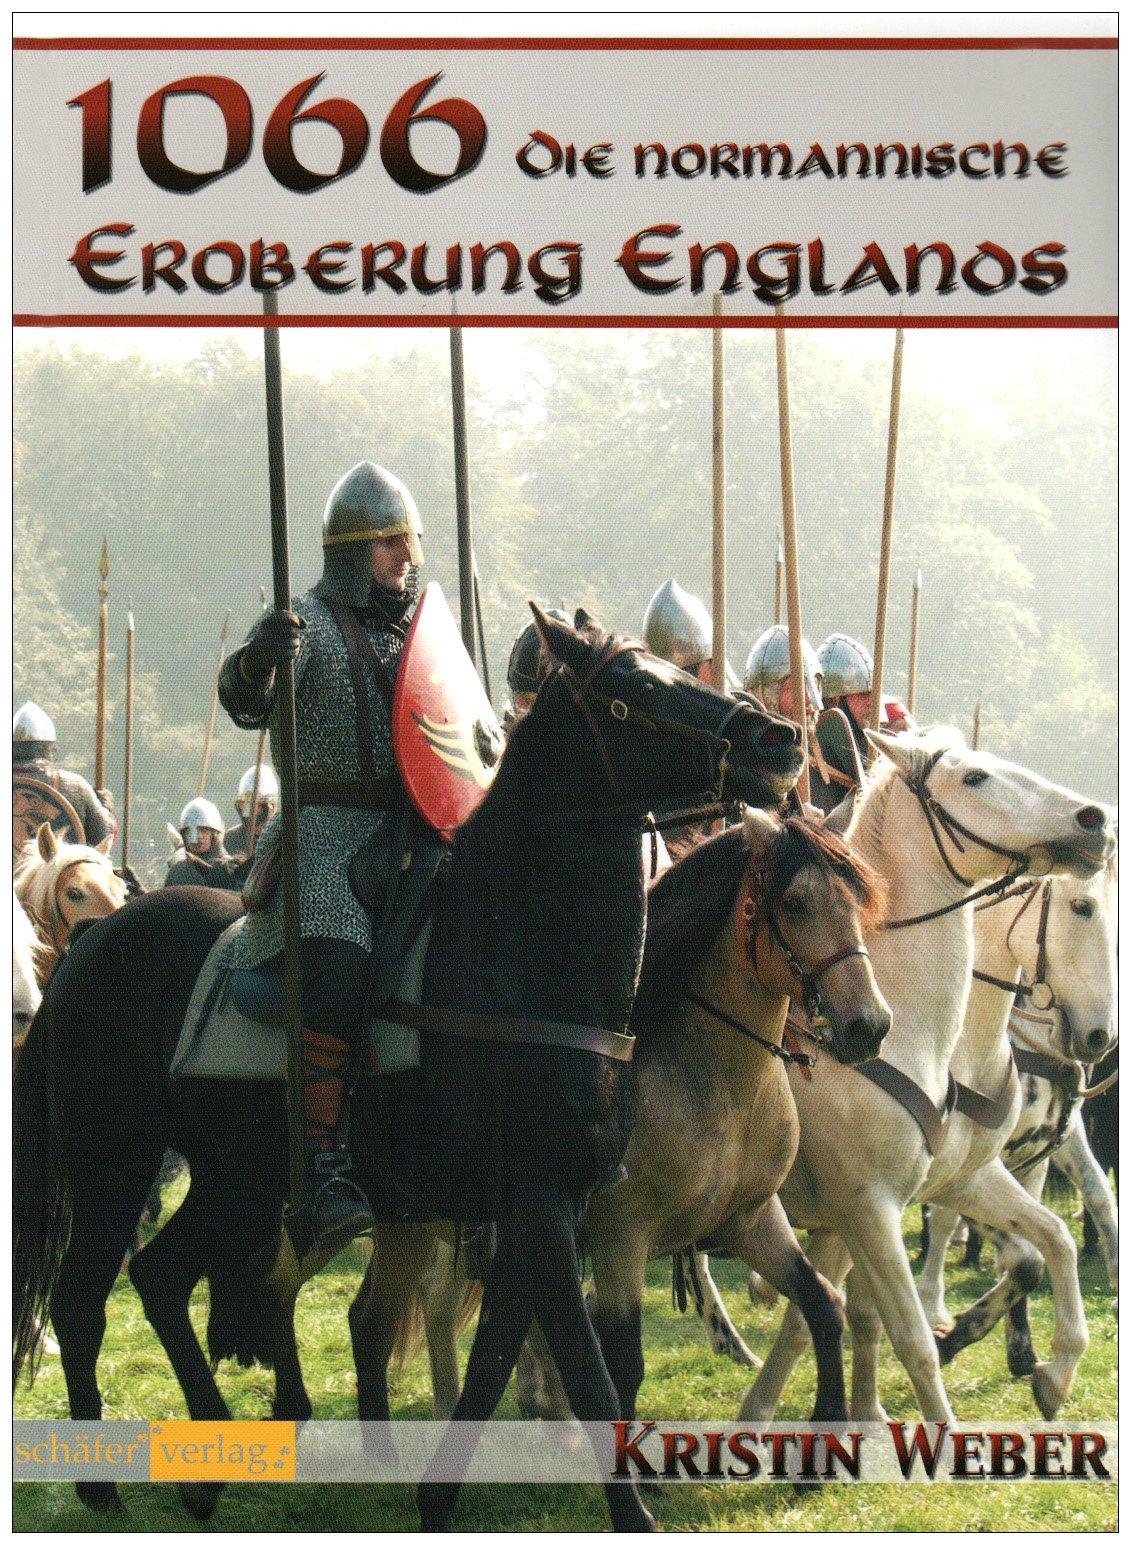 1066 - Die normannische Eroberung Englands